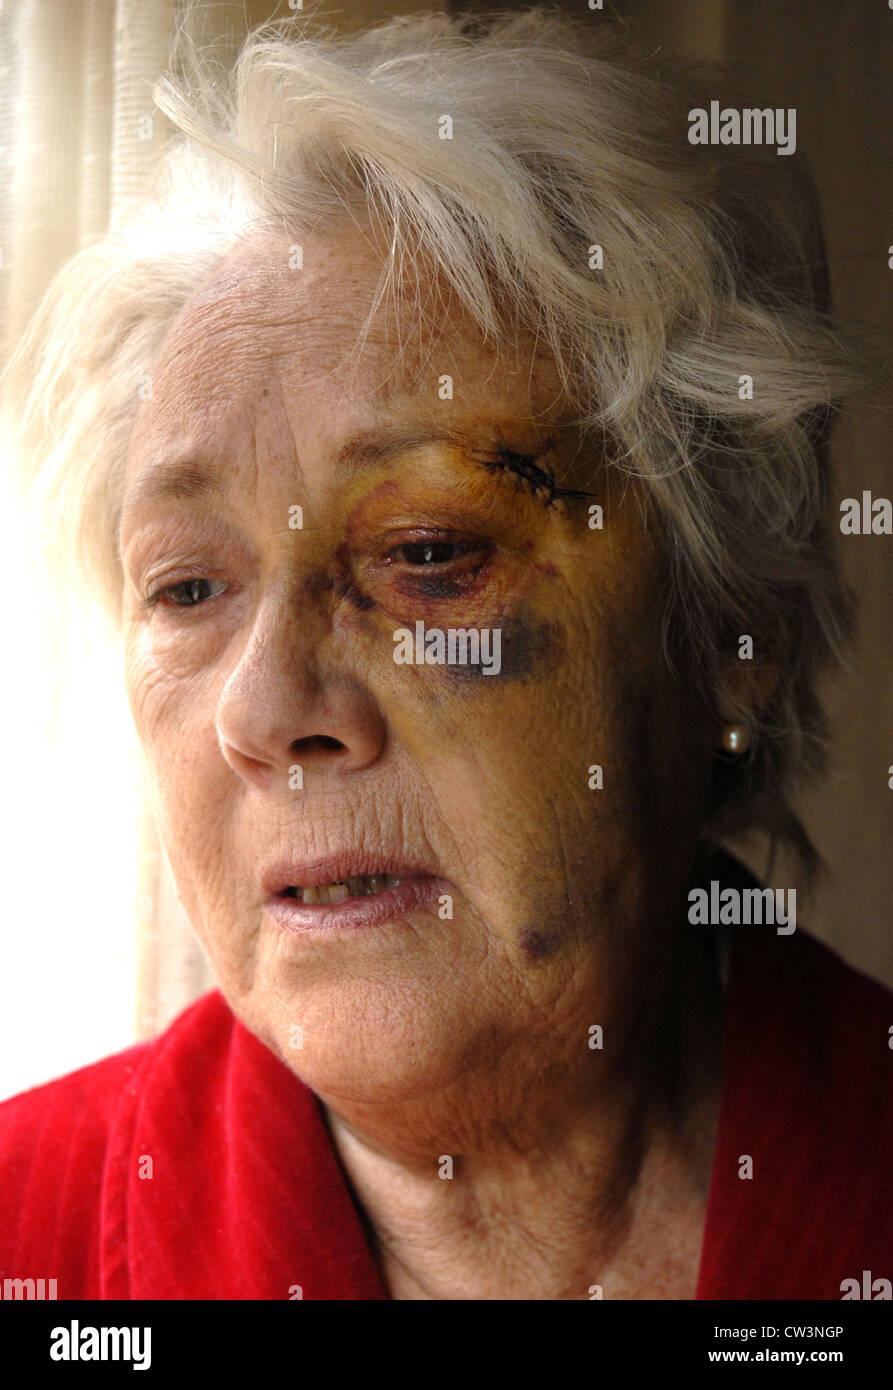 Woman victim of domestic violence - Stock Image